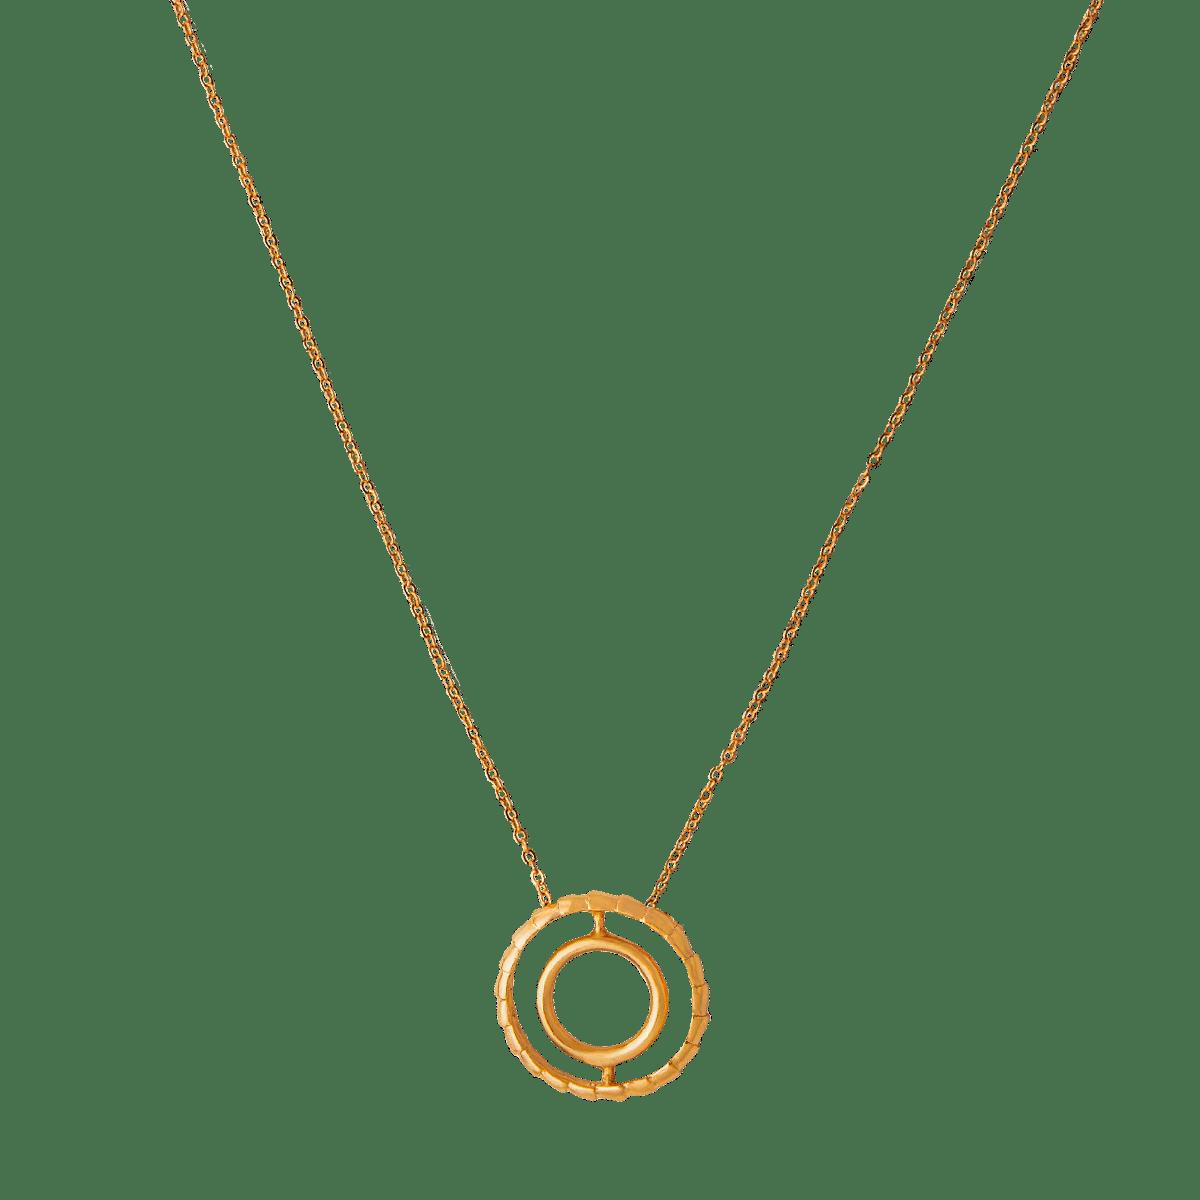 Concentric Circle Pendant